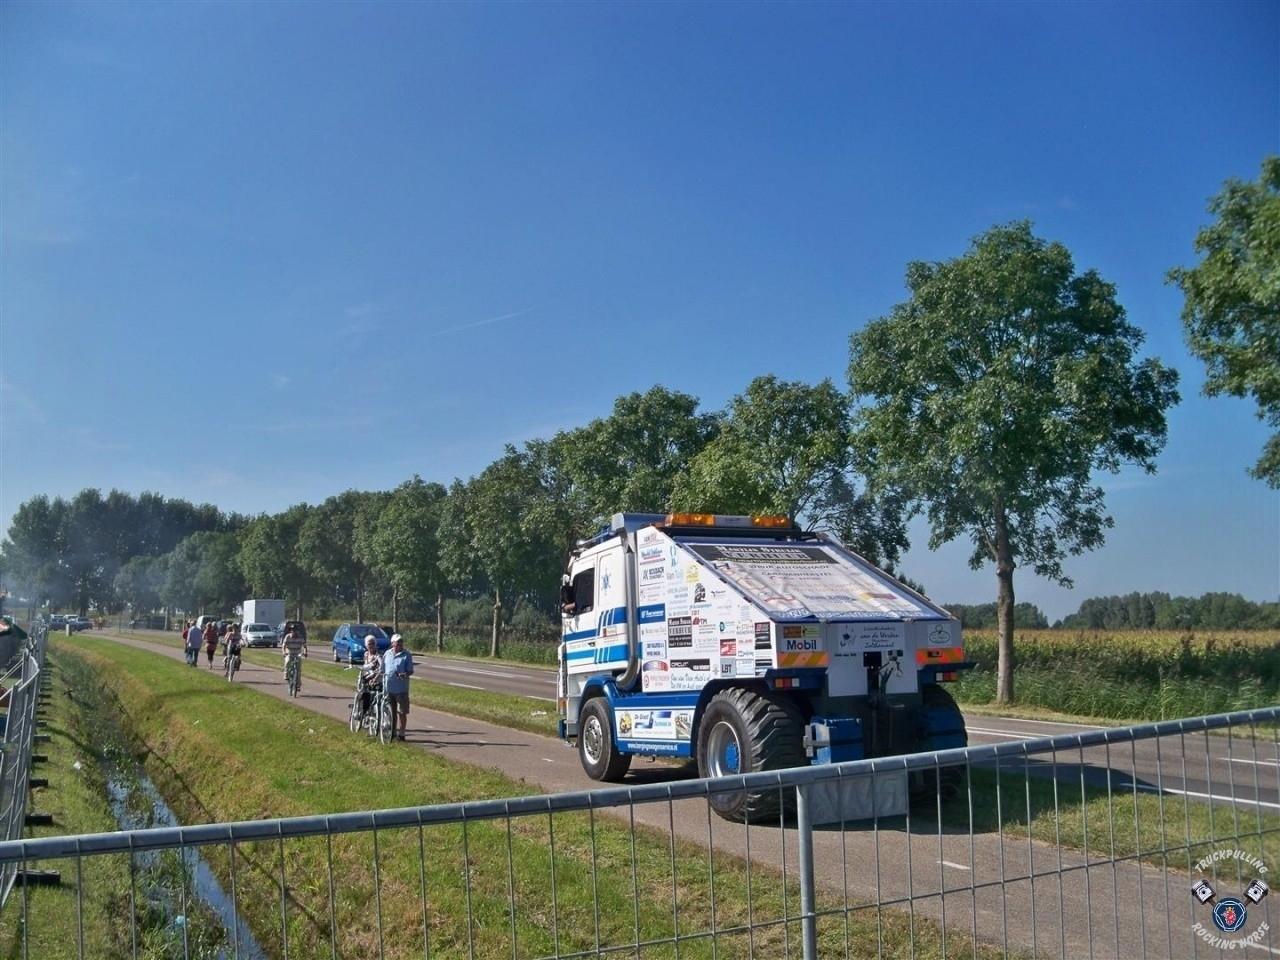 almkerk-2012-015